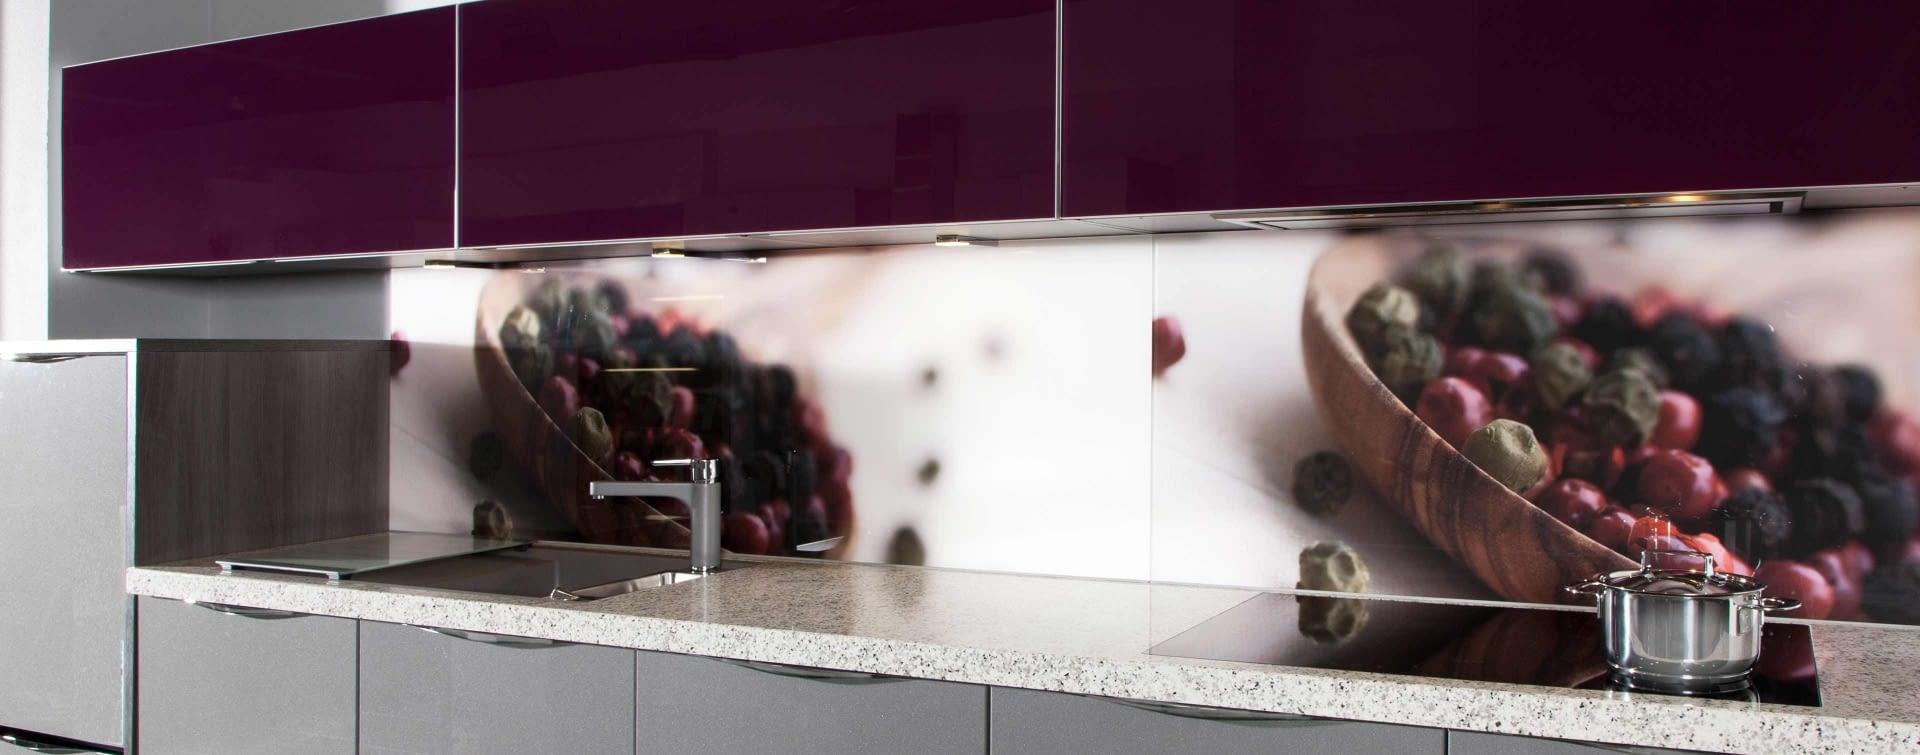 spritzschutz kuche hannover. Black Bedroom Furniture Sets. Home Design Ideas